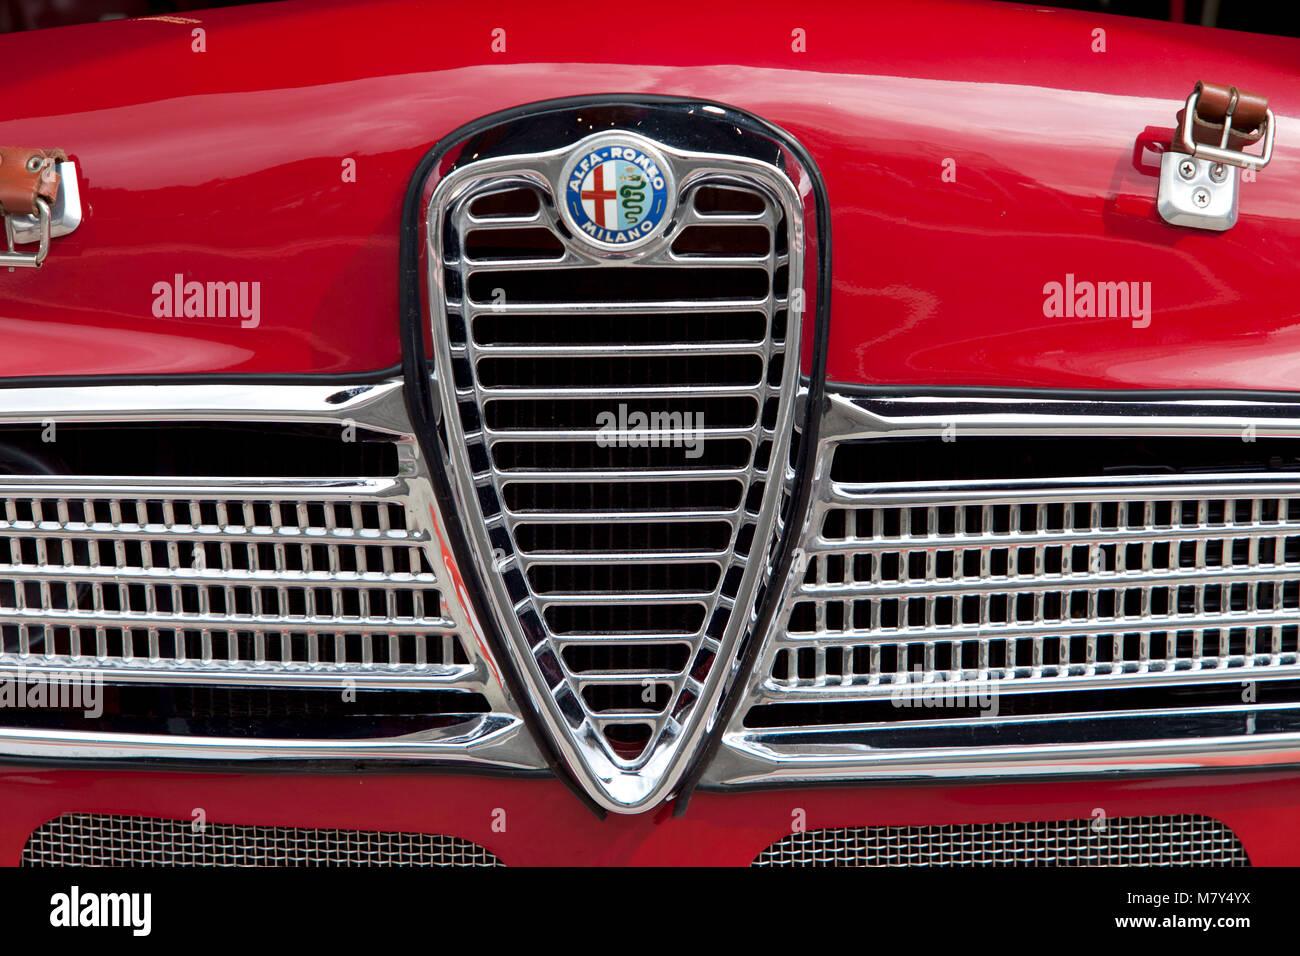 1960 S Red Alfa Romeo Front Grill Close Up Classic Car Art Design Stock Photo Alamy